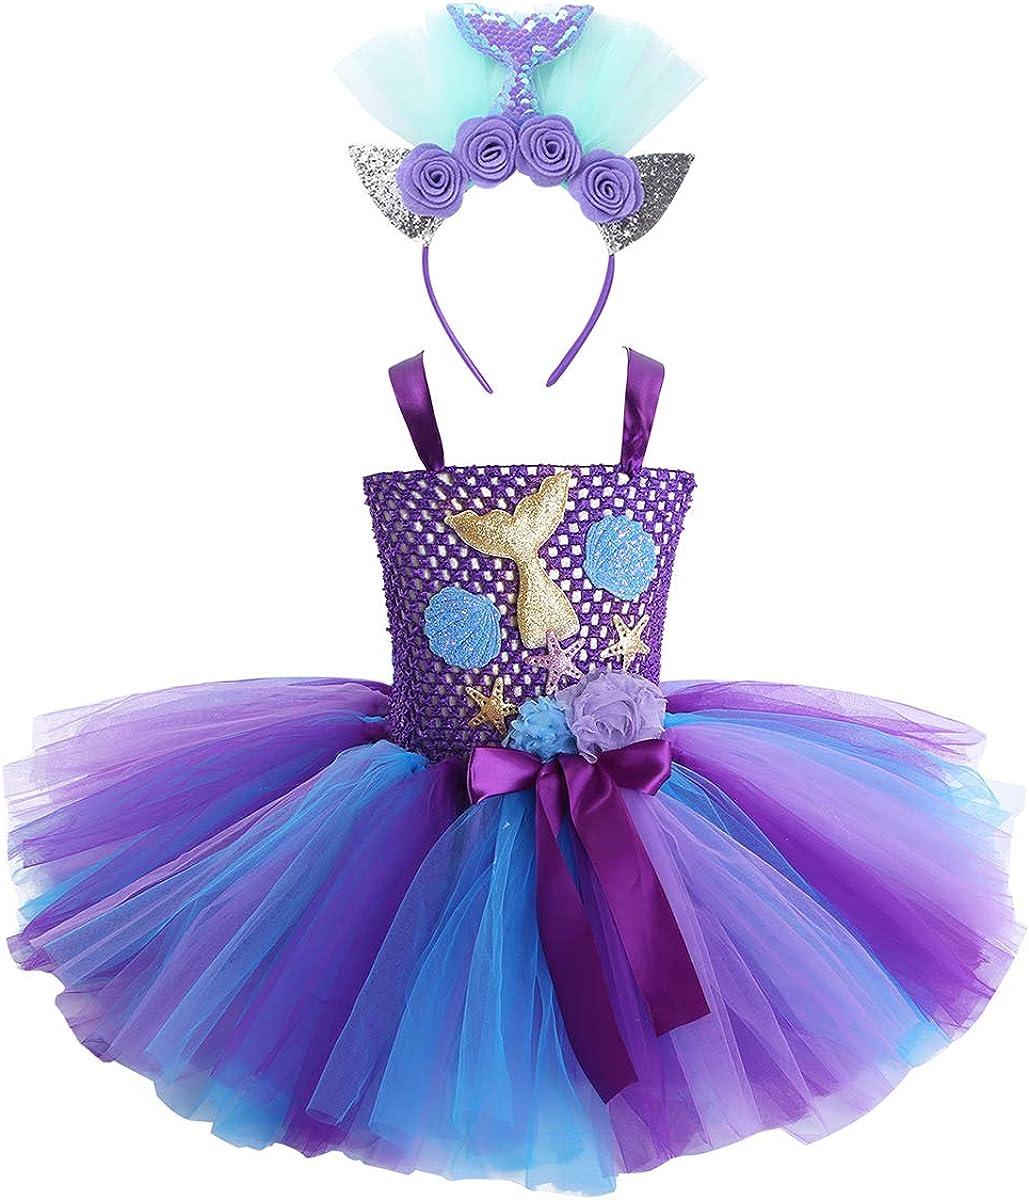 Jurebecia Mermaid Tutu Dress Girls Halloween Birthday Party Role Play Costume Princess Mermaid Dress Up Clothes with Headband